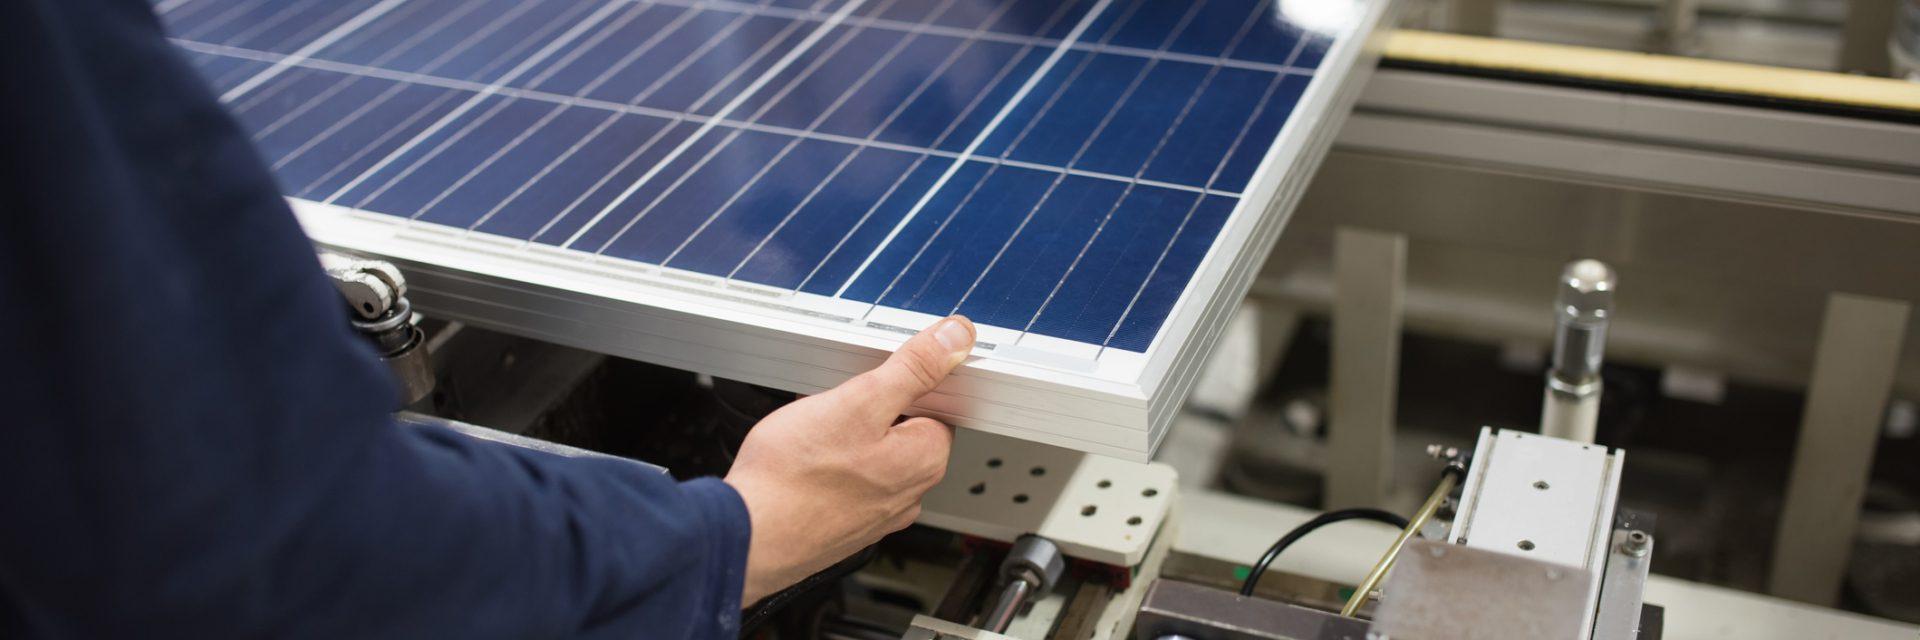 solar-panel-manufacture